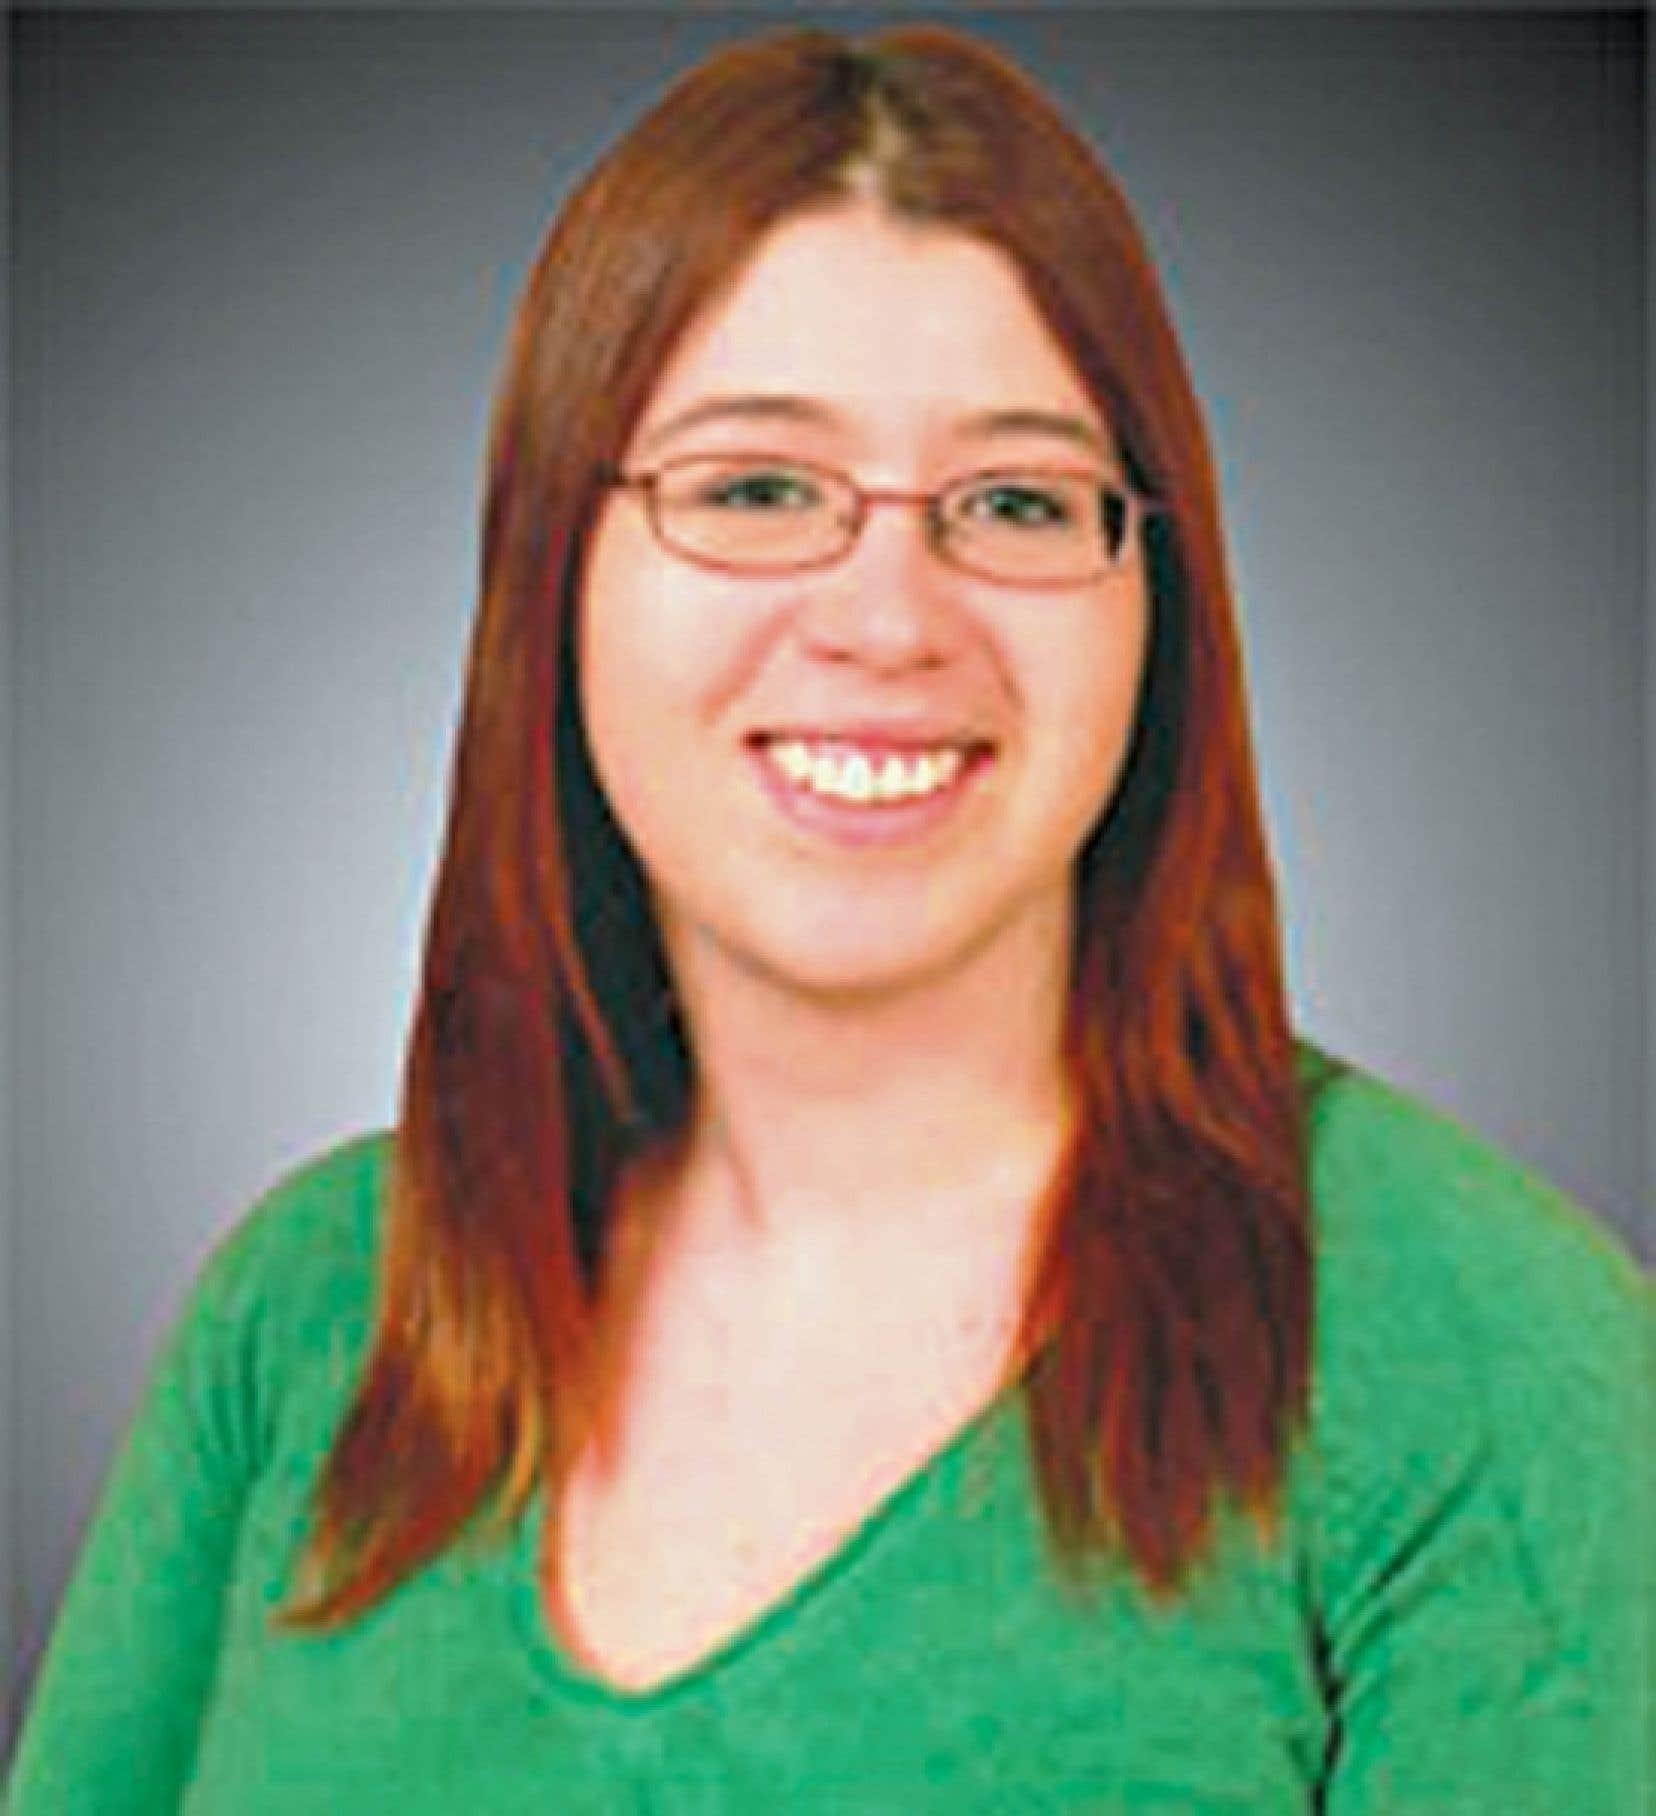 Forum on this topic: Dyanne DiRosario, rachel-shelley/